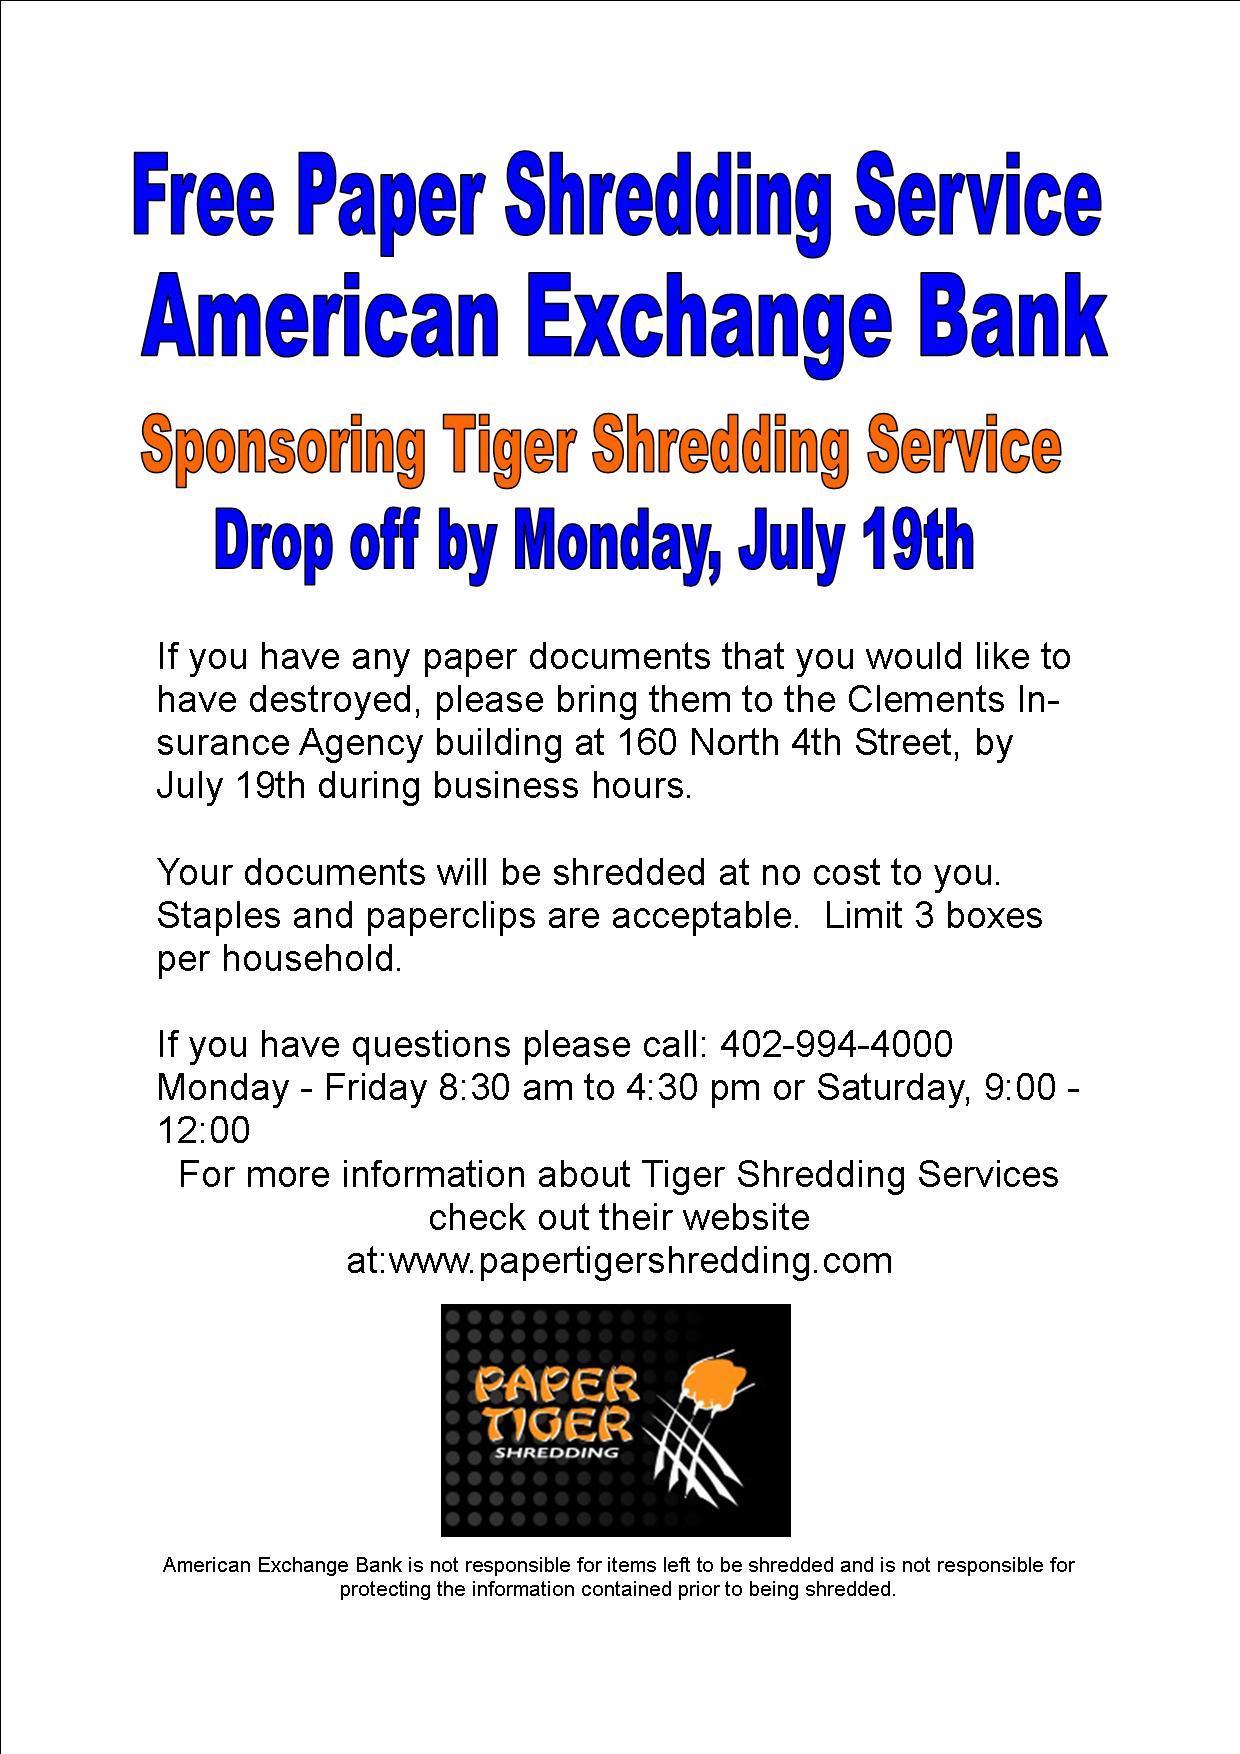 Tiger Shredding & Recycling